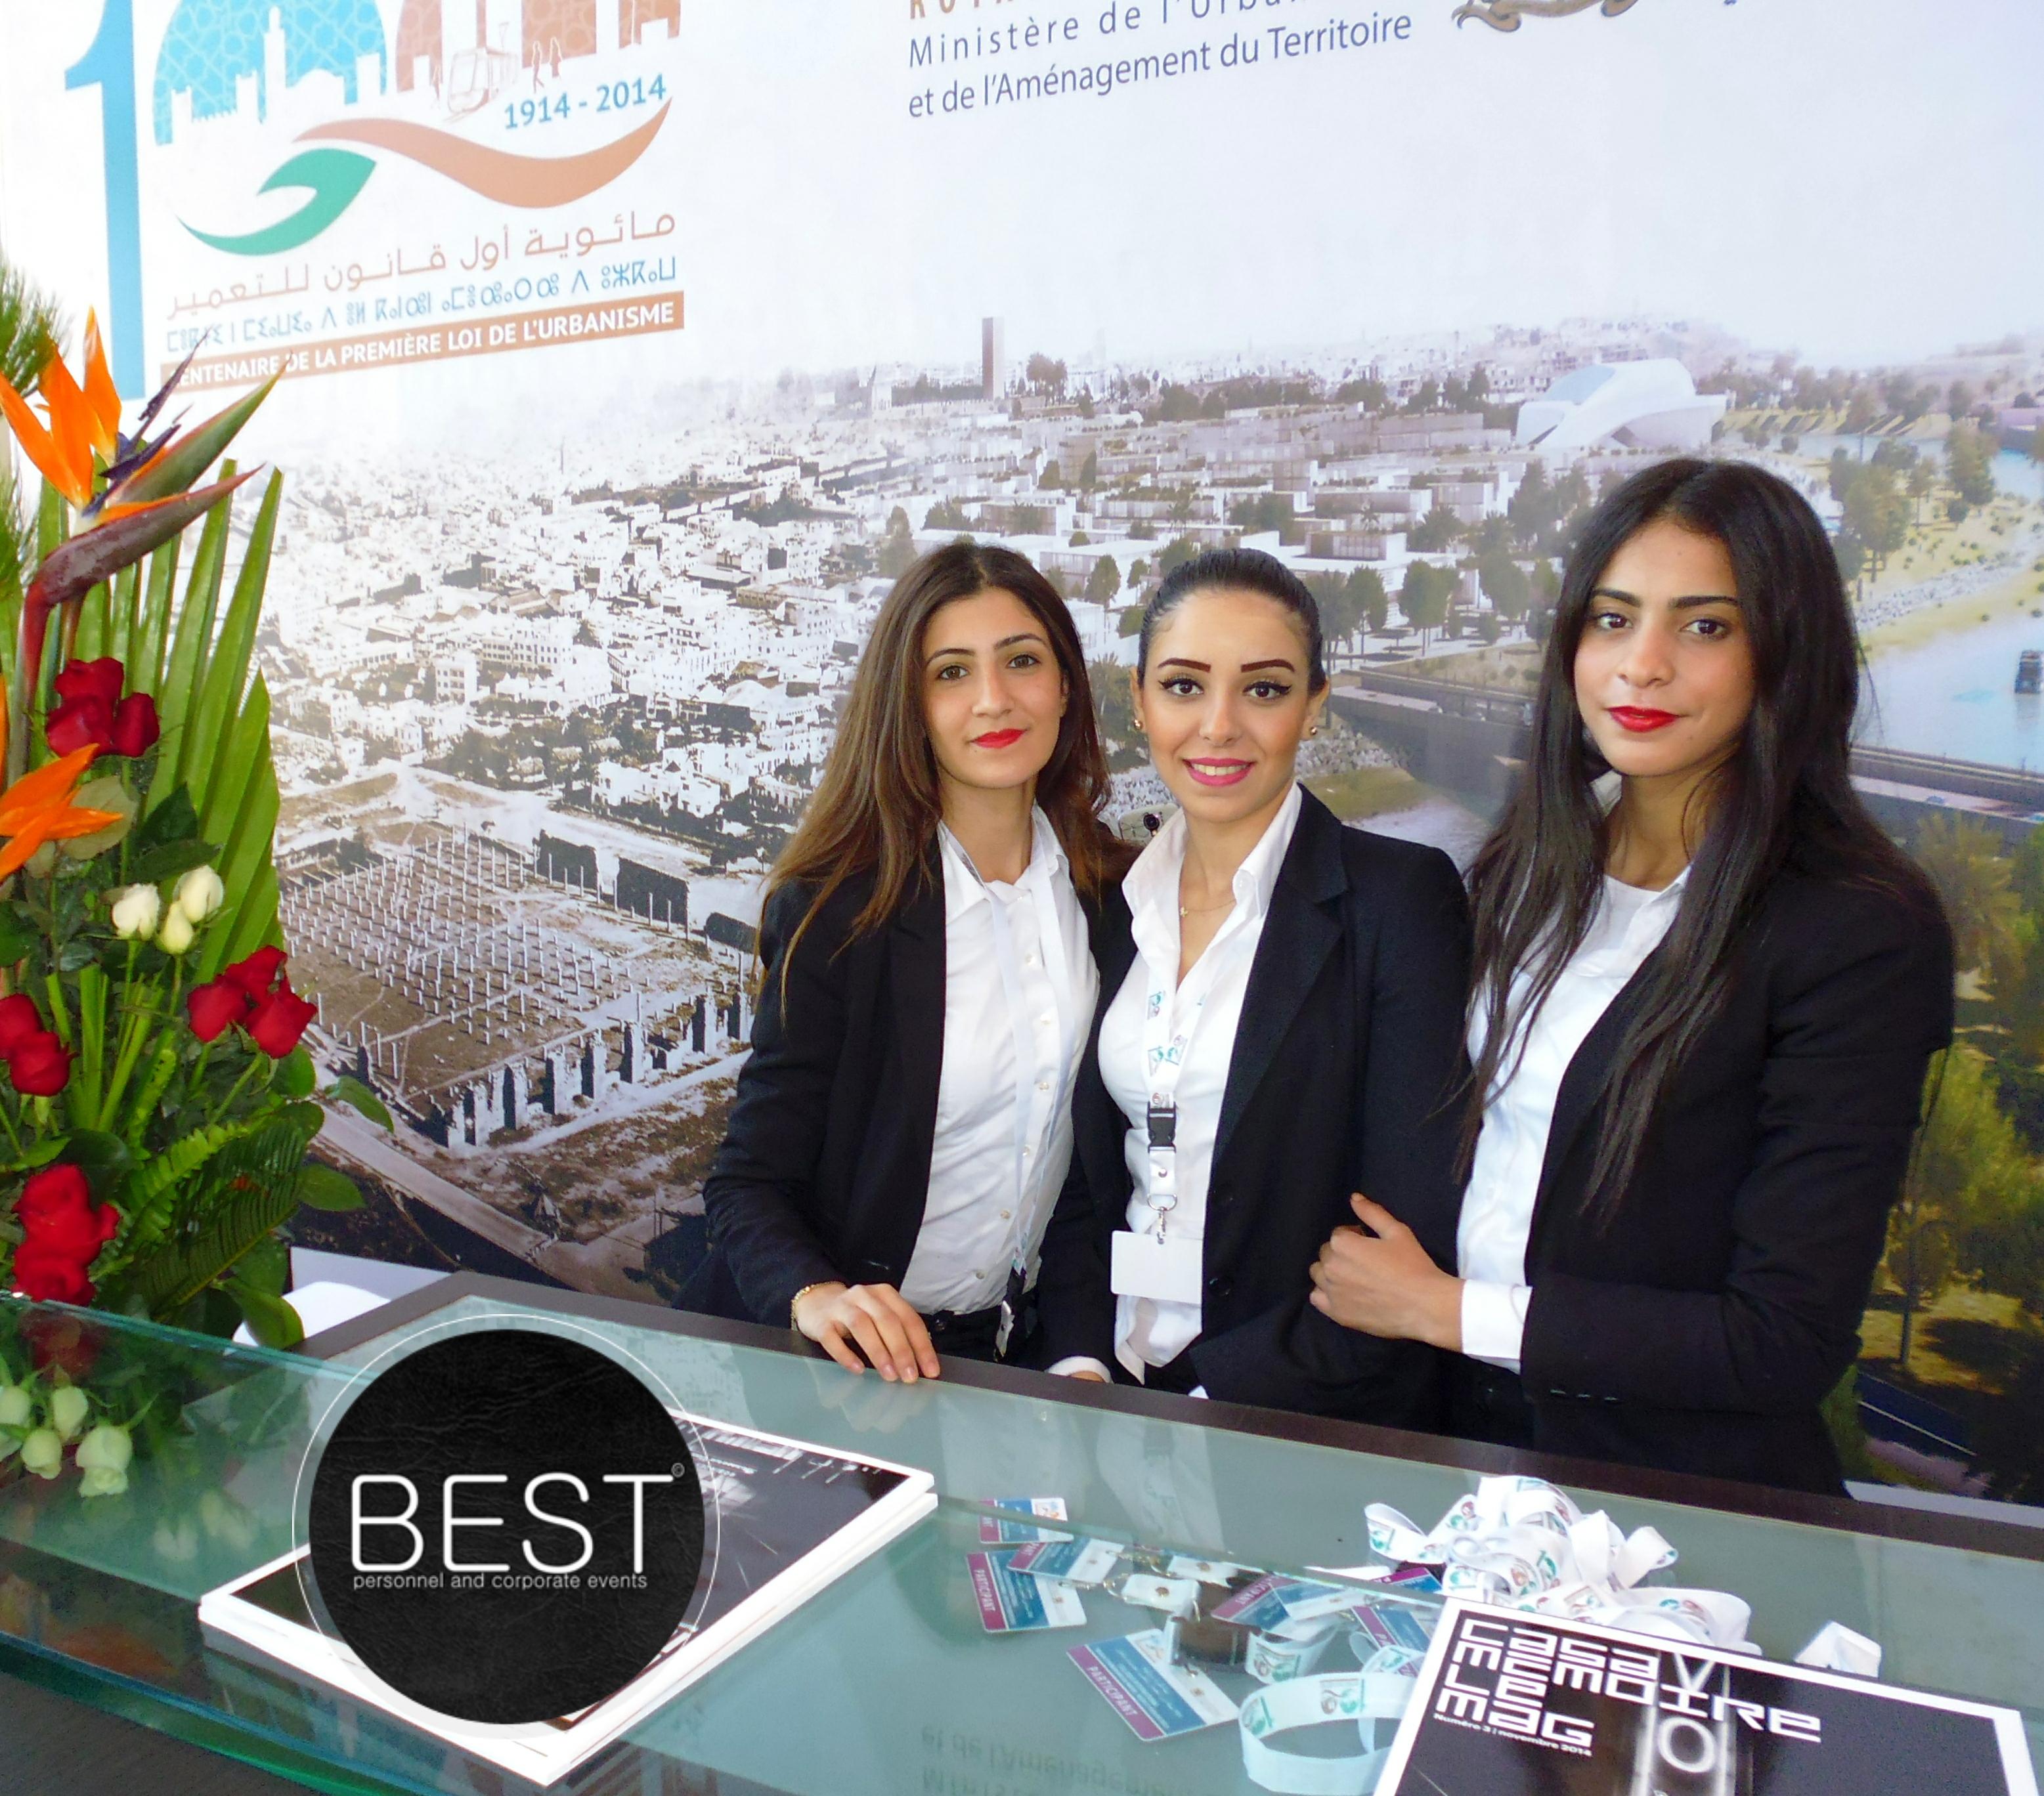 Best Agence